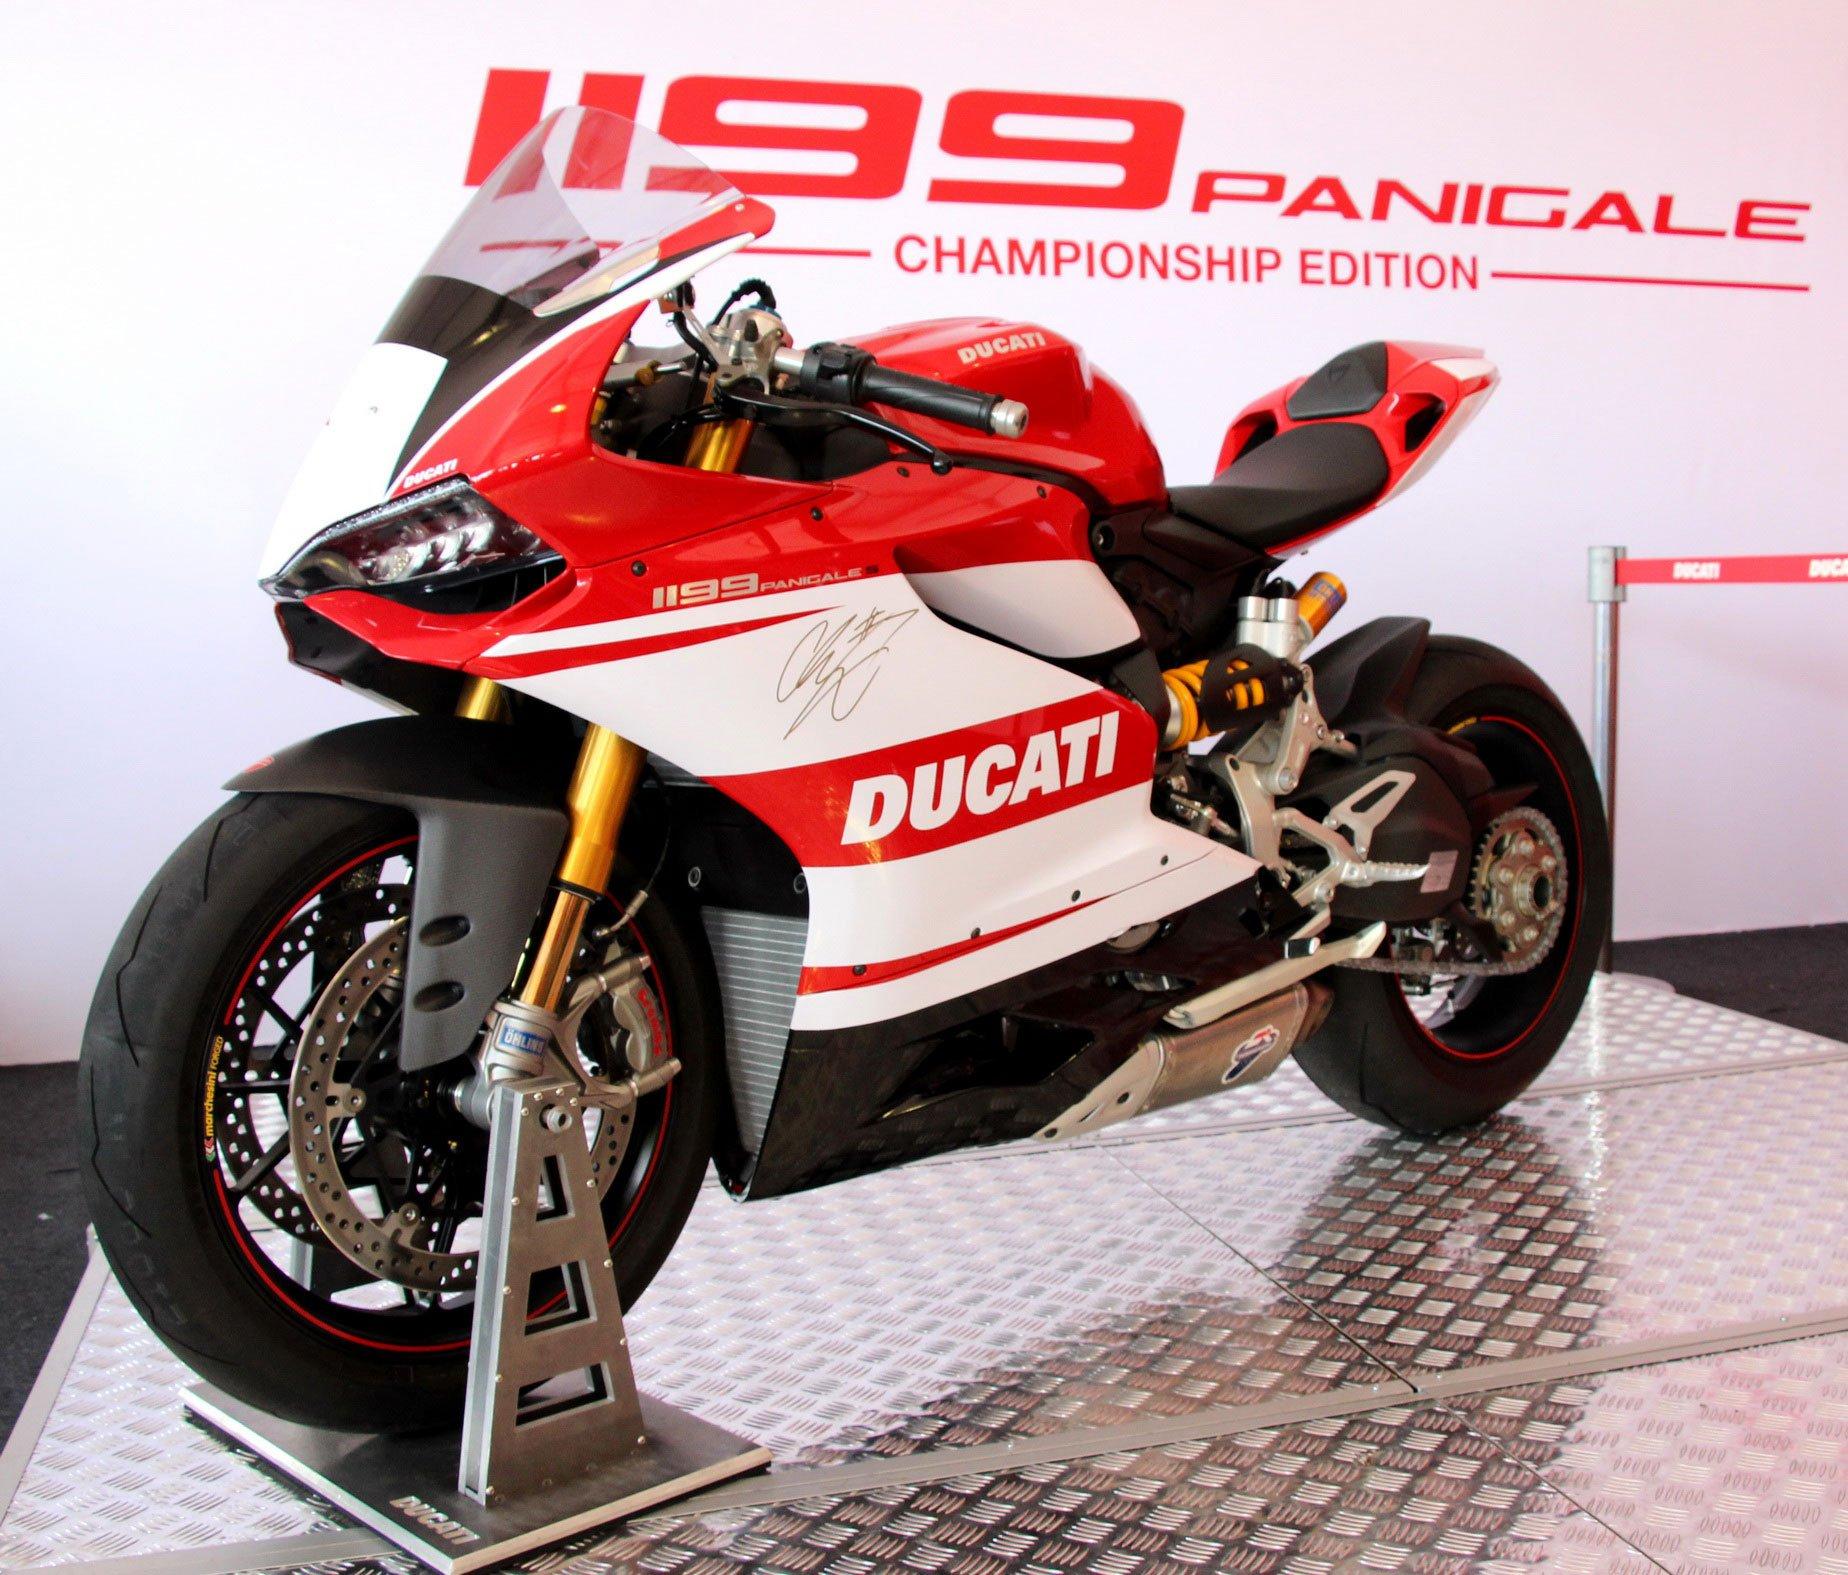 Ducati 1199 Panigale Championship Edition, 10 units Paul Tan - Image